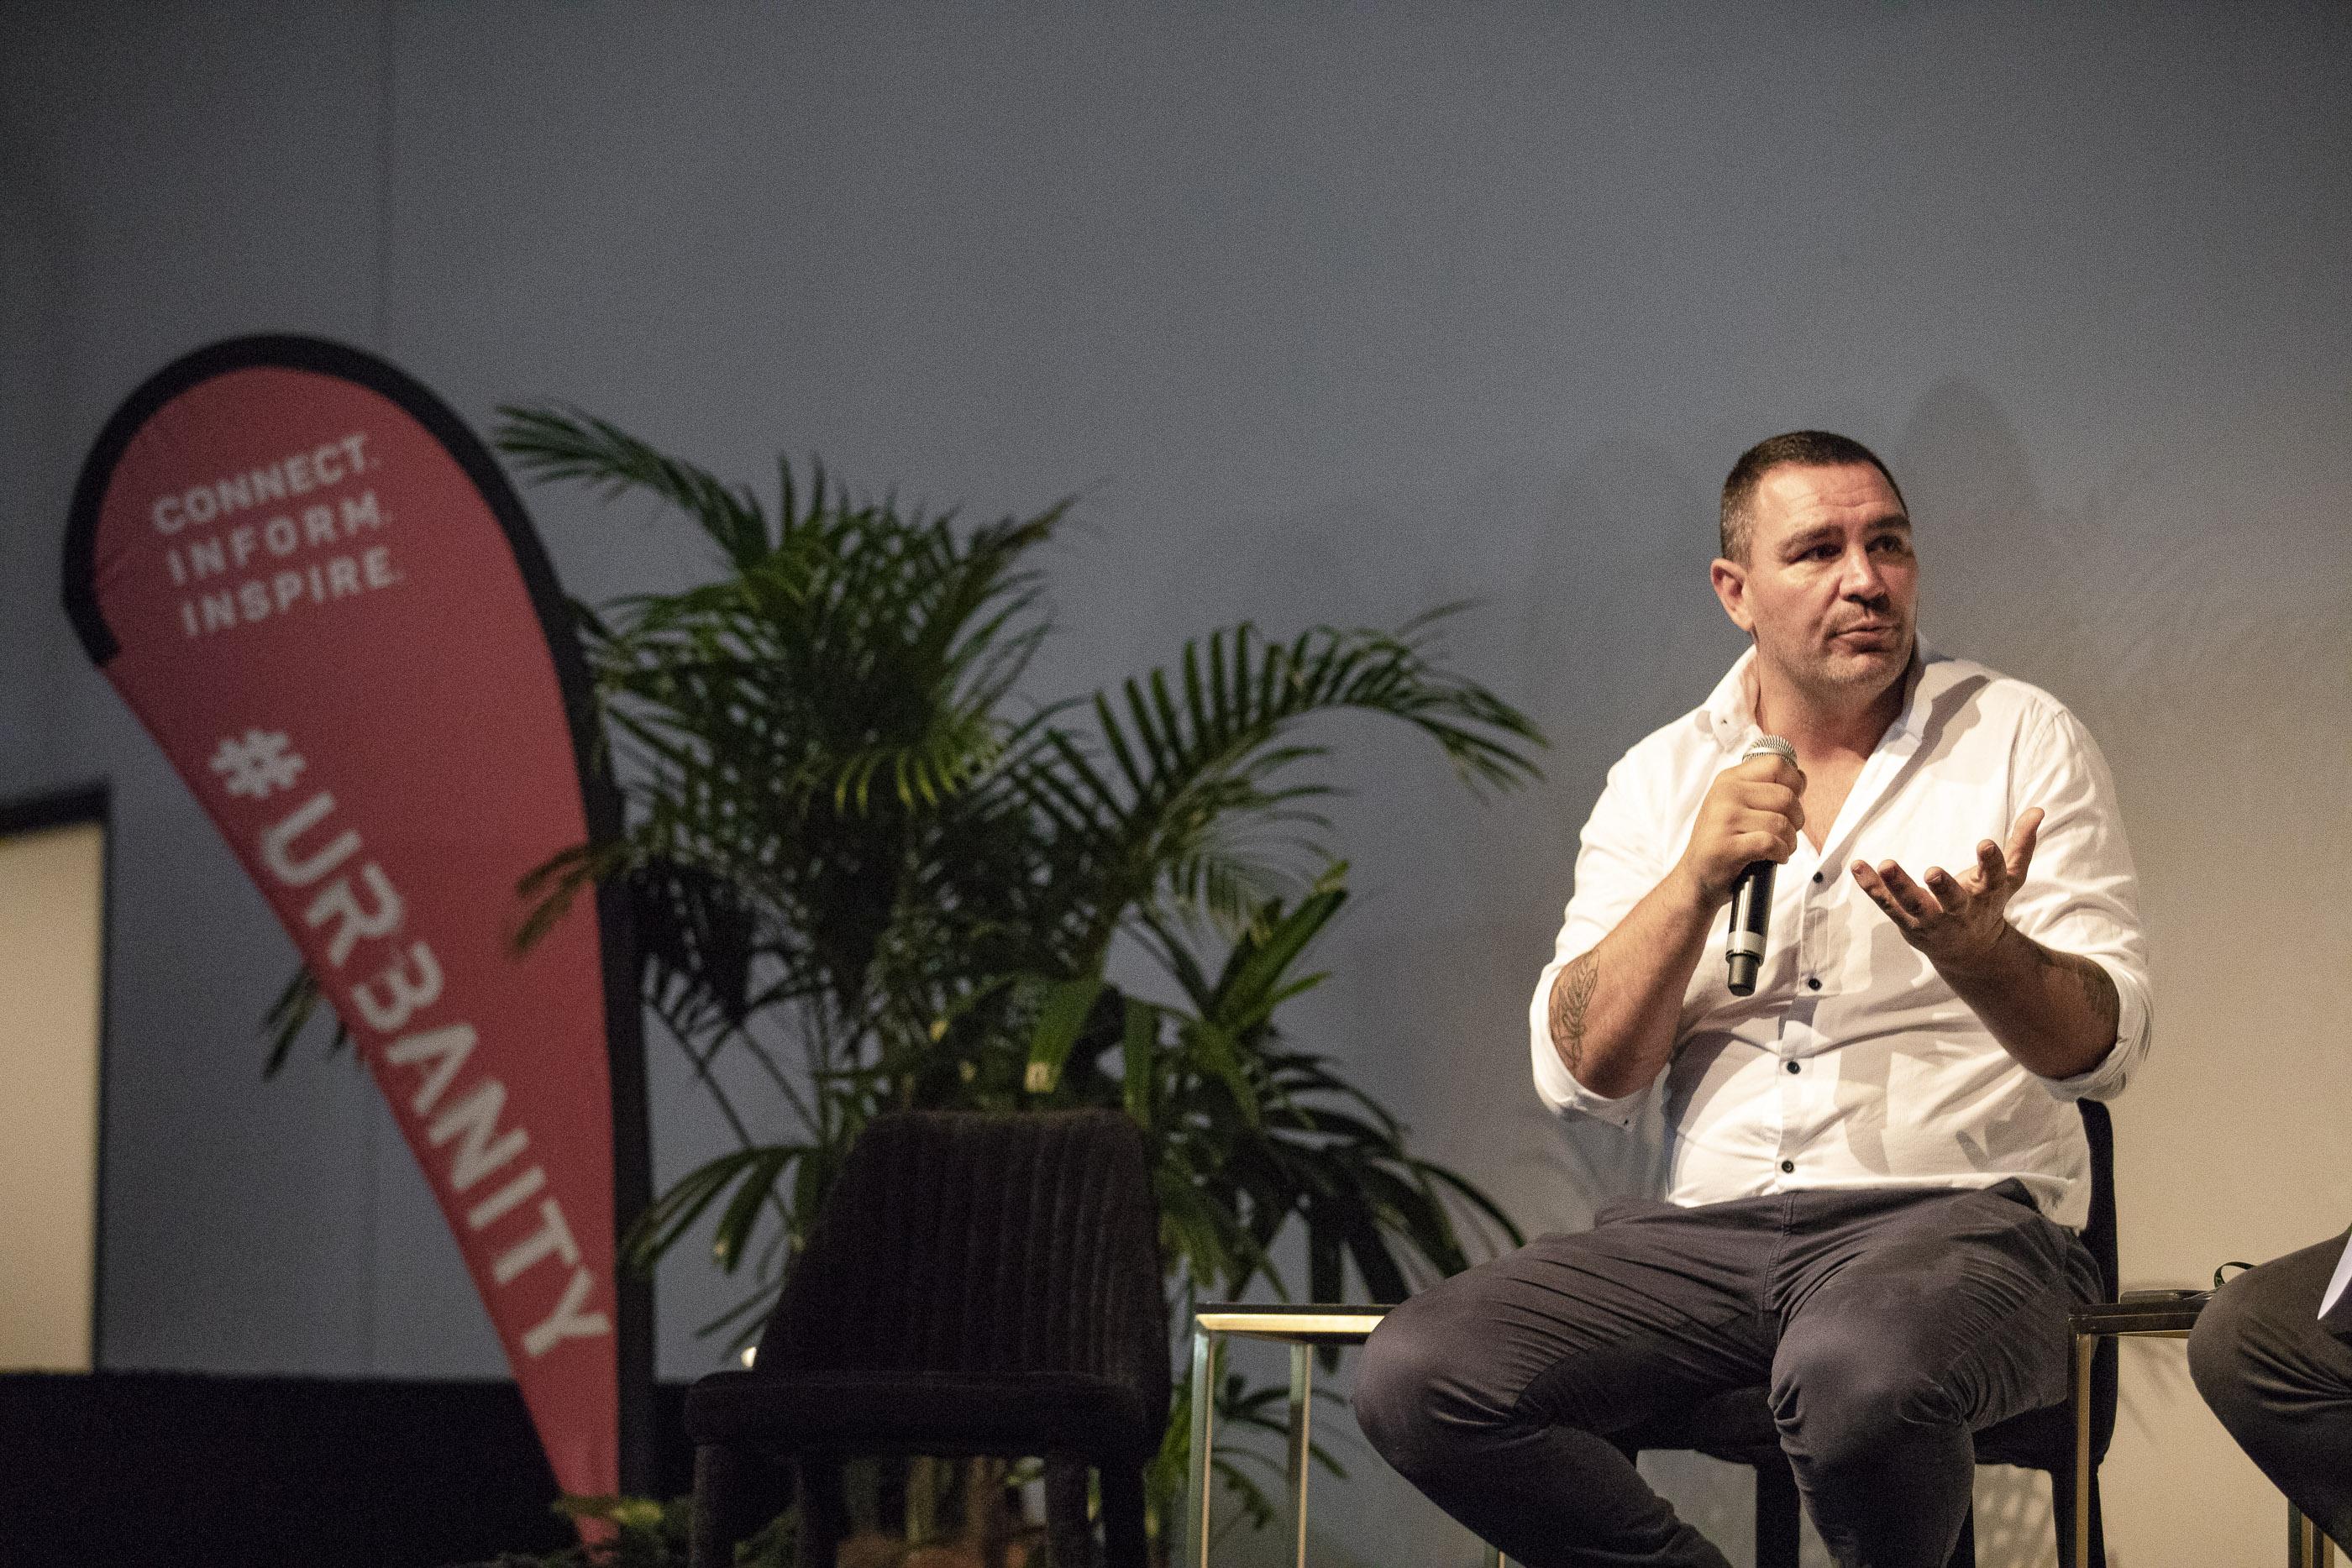 Donovan speaking at Urbanity 2018